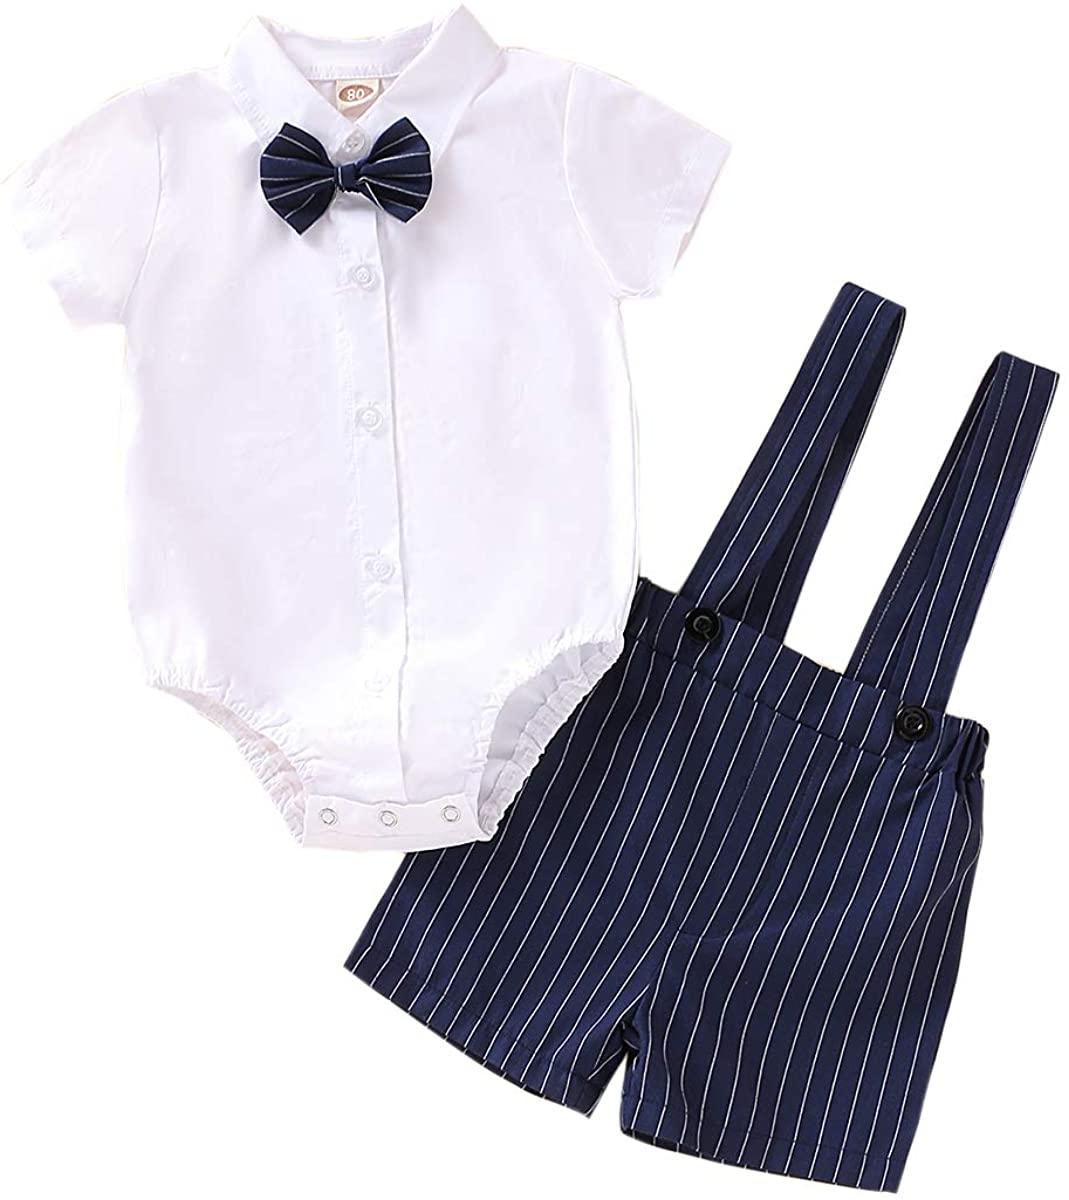 Baby Boy Little Man Gentleman Sets Cotton and Linen Plaid Romper Strap Shorts Summer Toddler Boy Outfits Sets